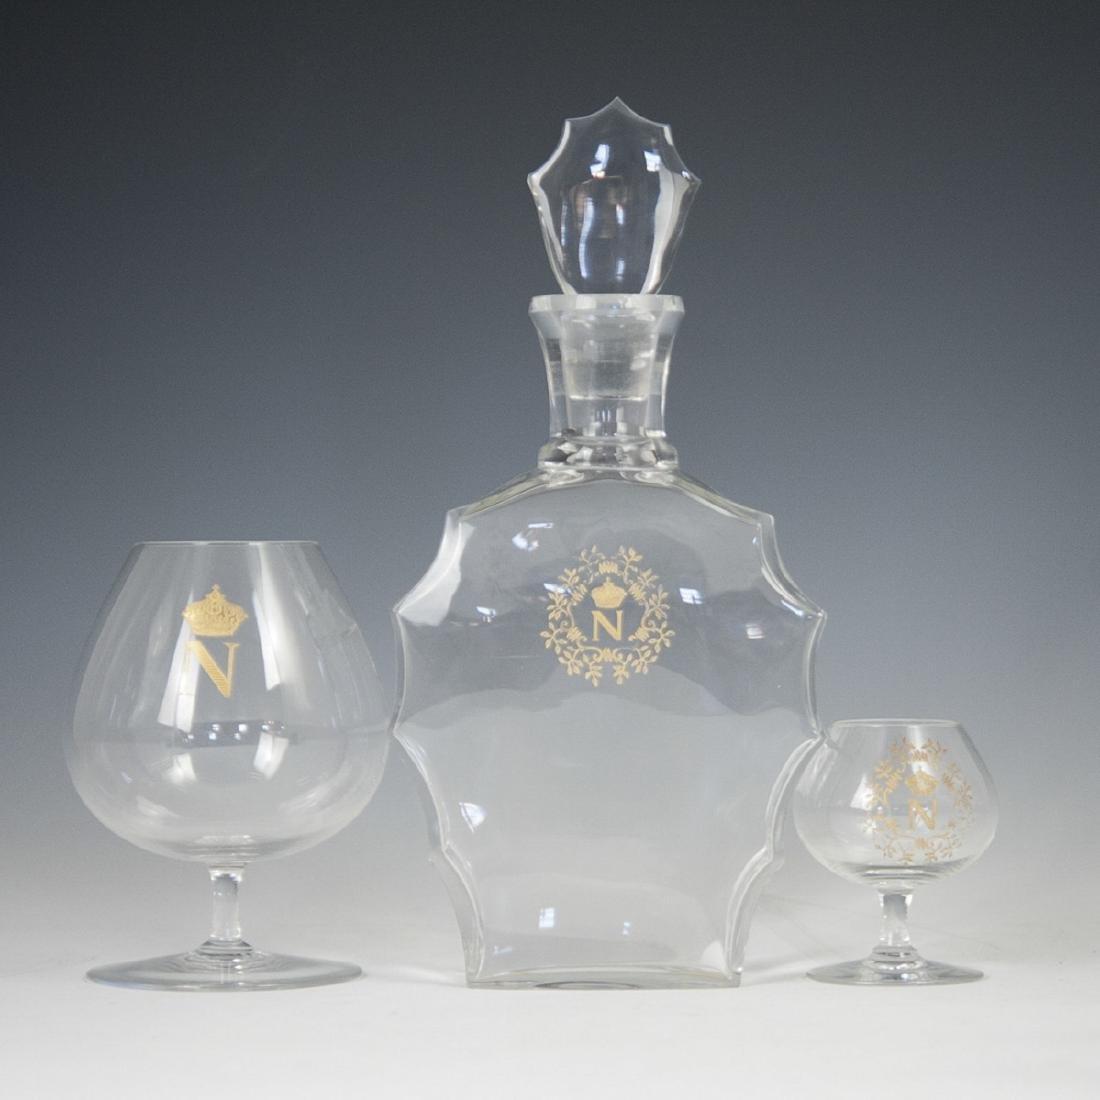 Baccarat Crystal Napoleon Set